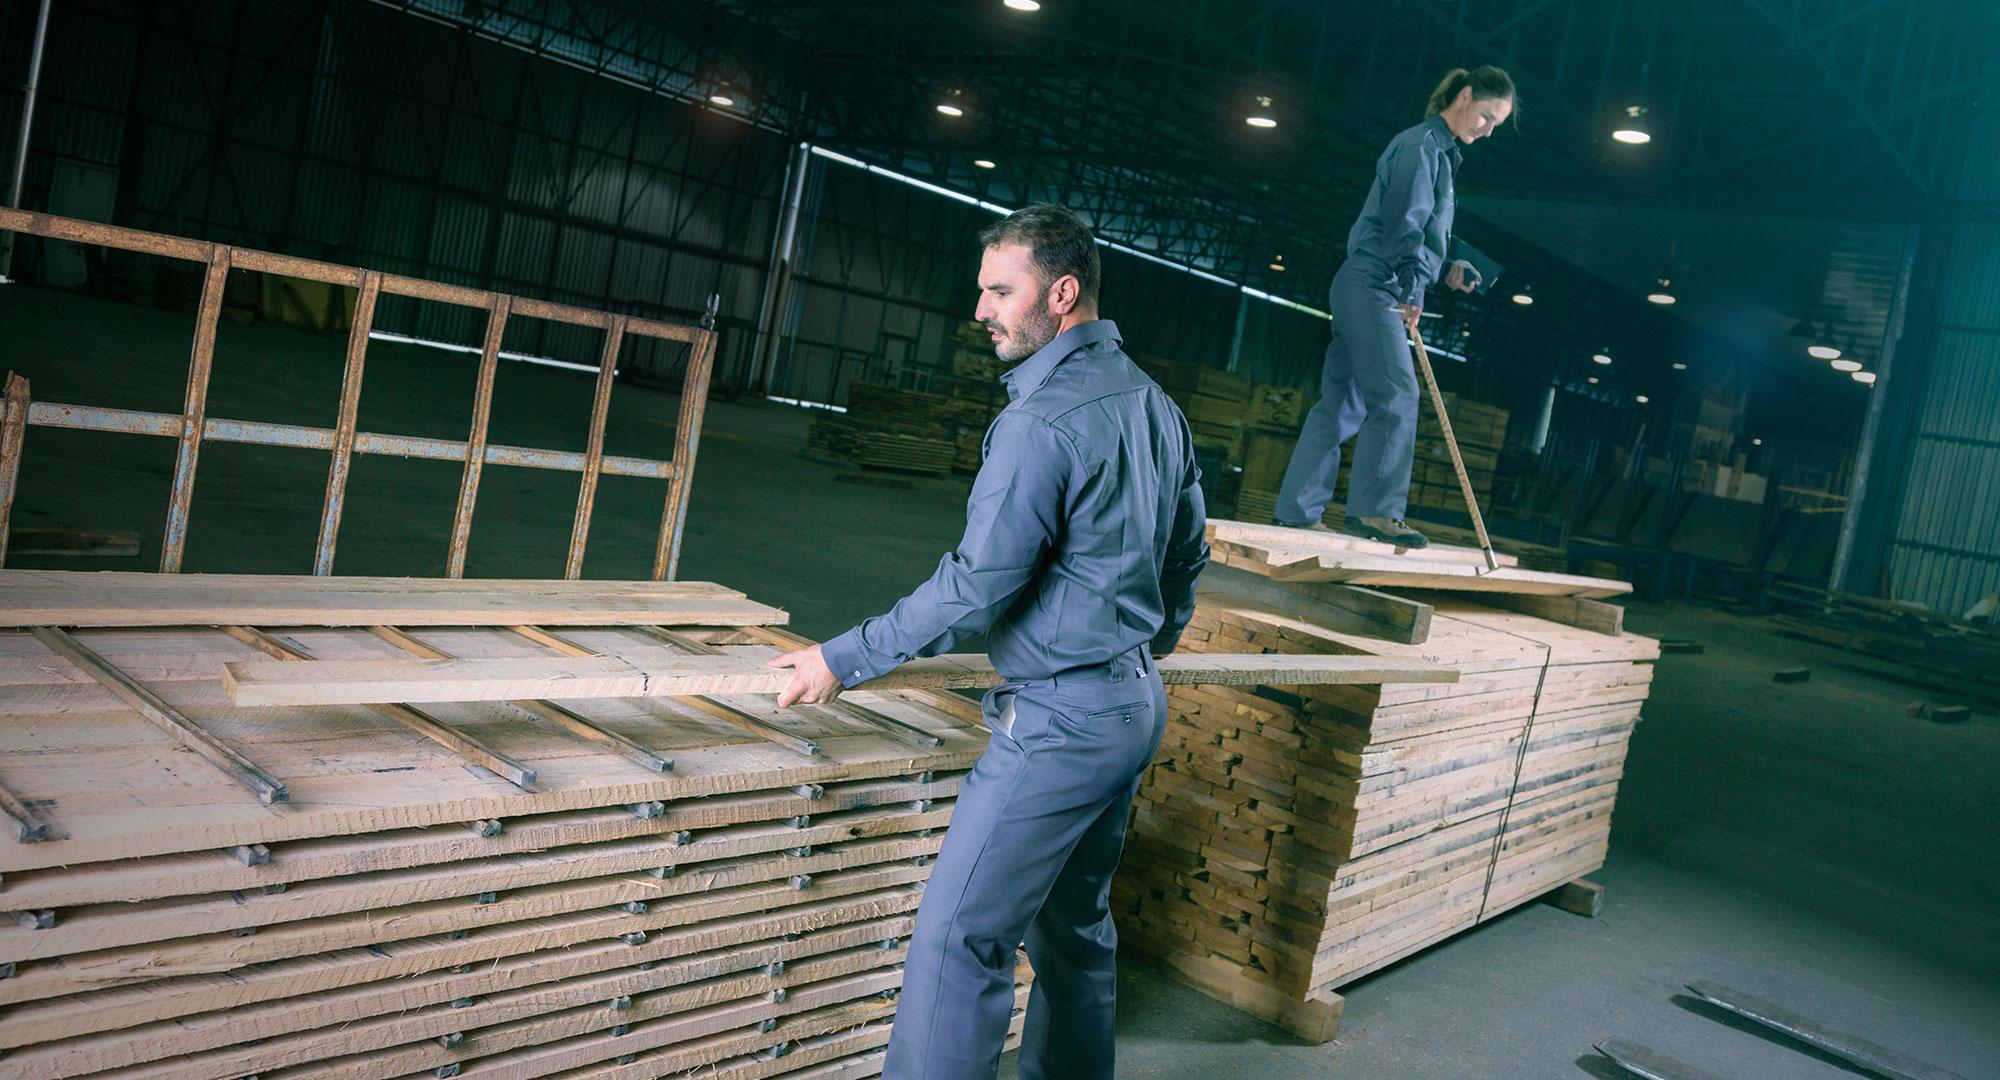 nordam produits forestier usine